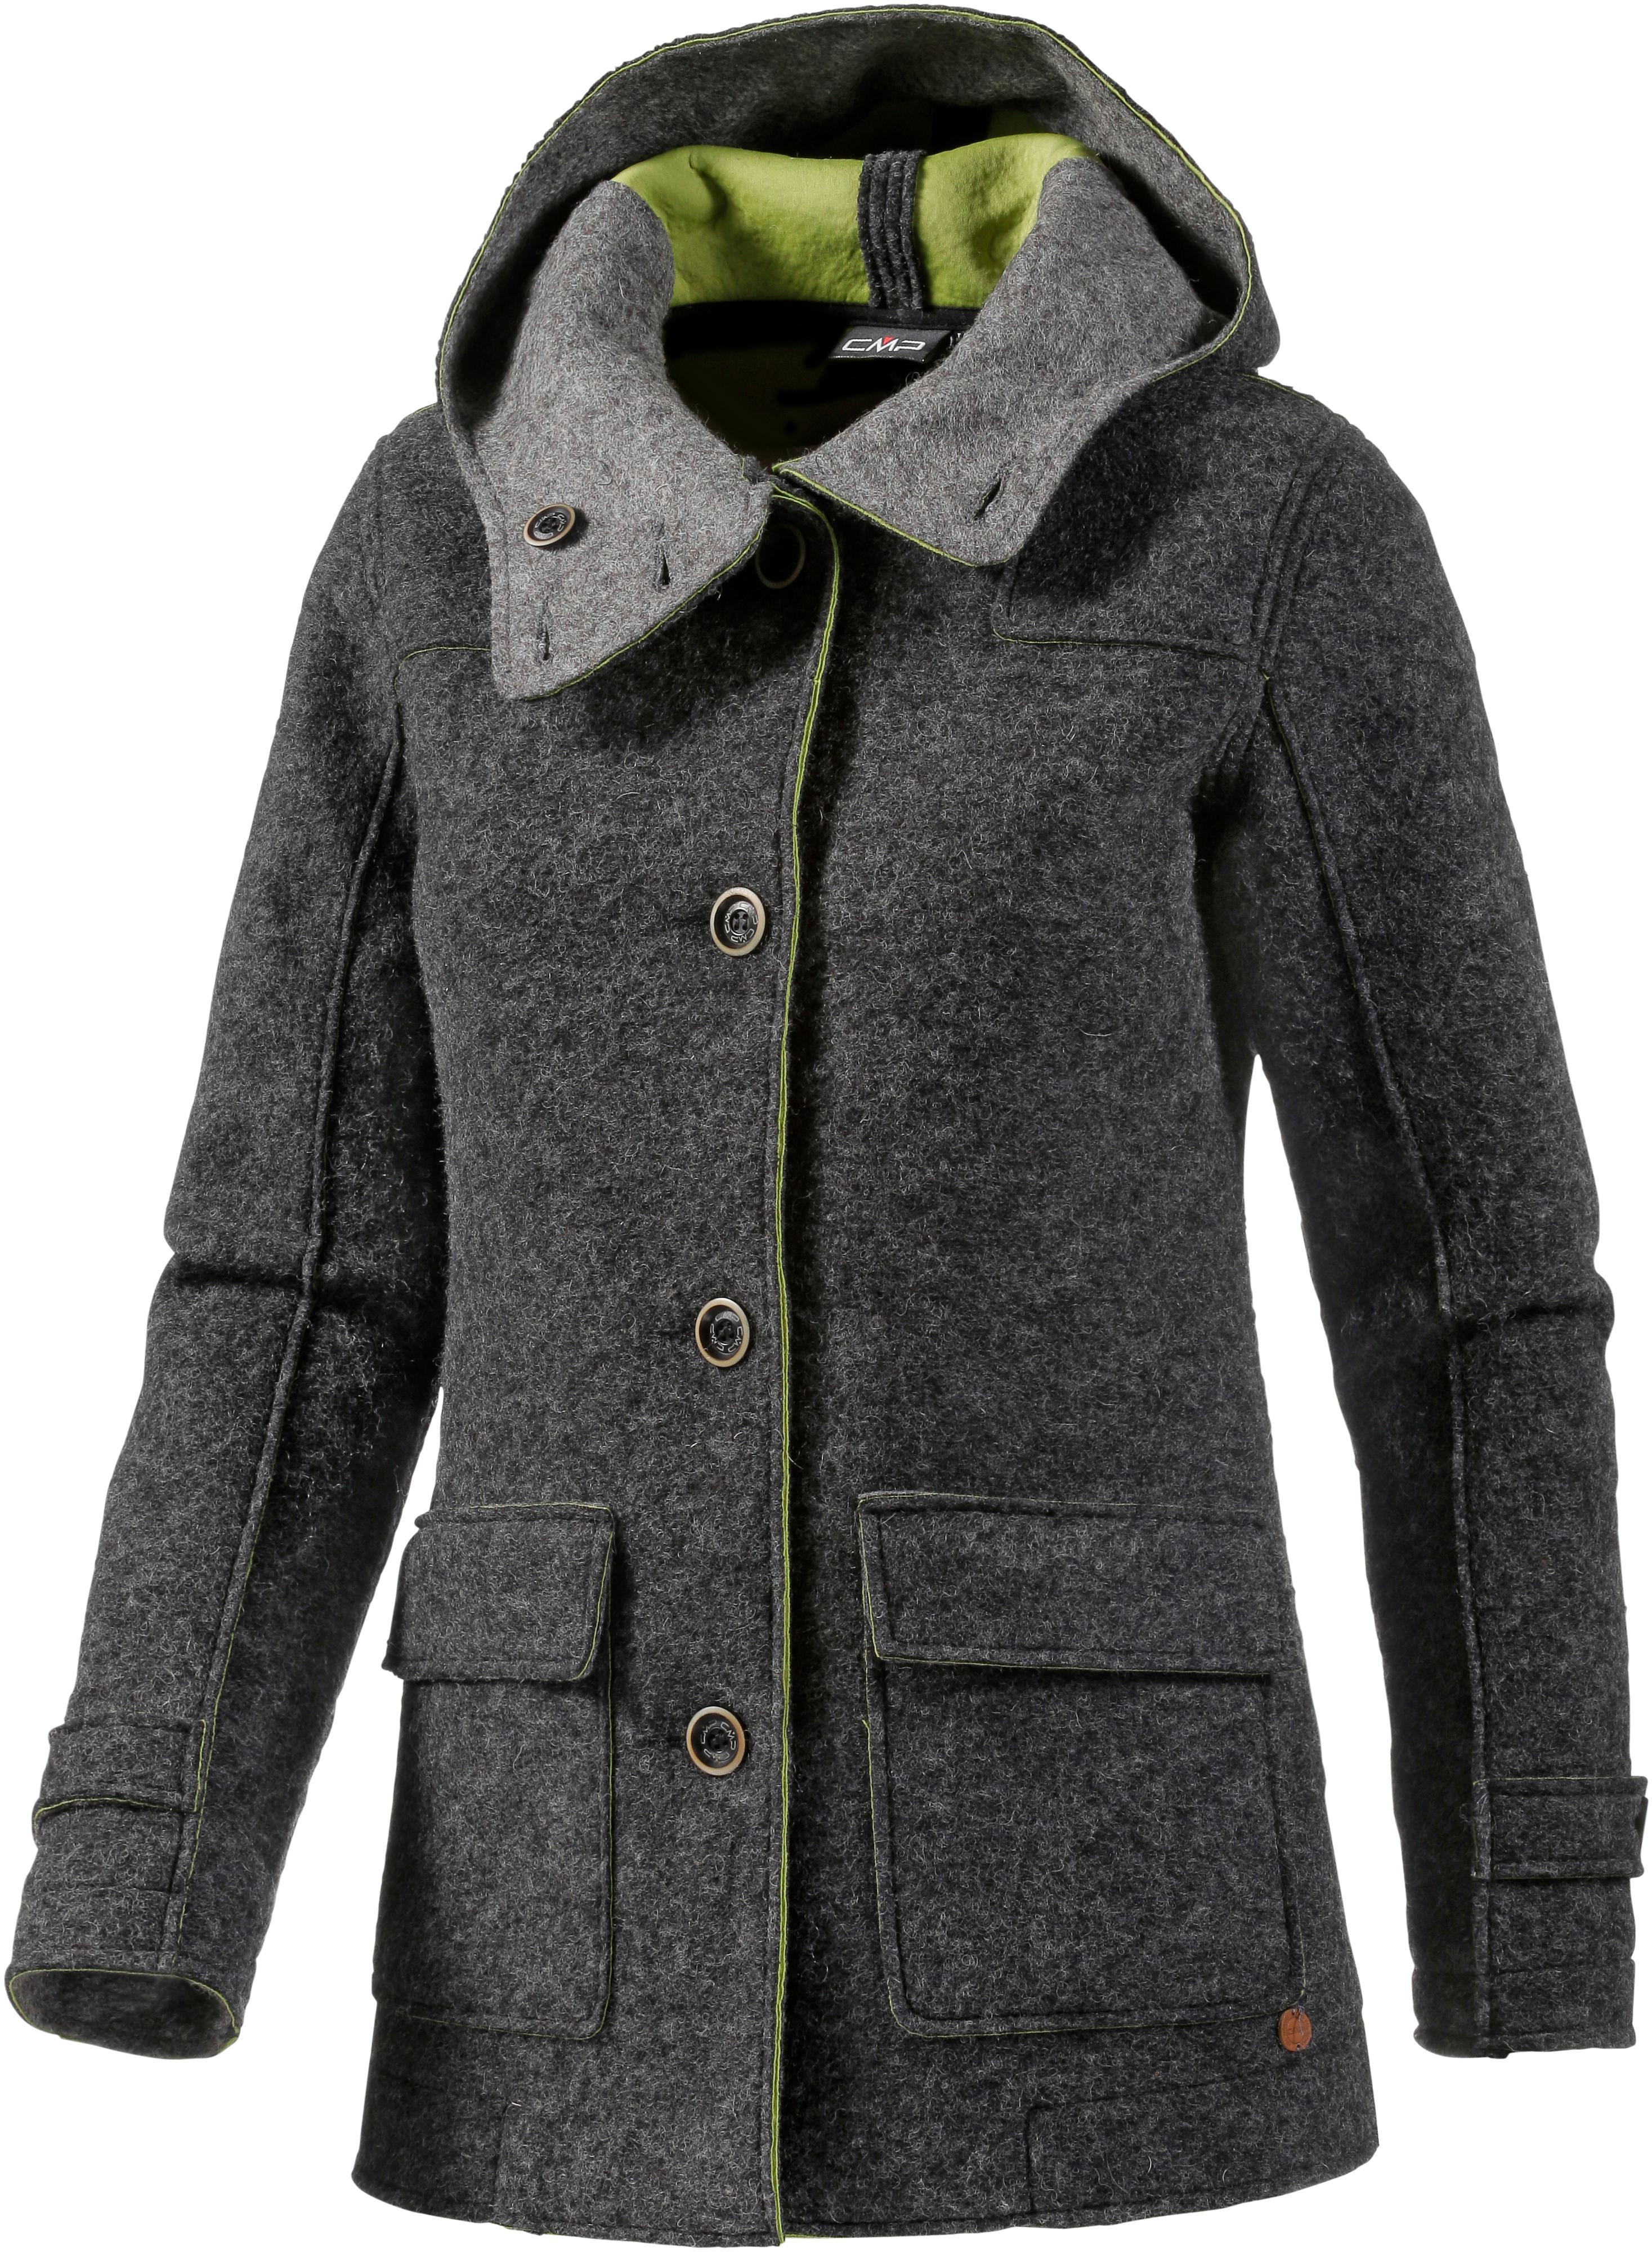 Cmp mantel damen wolle